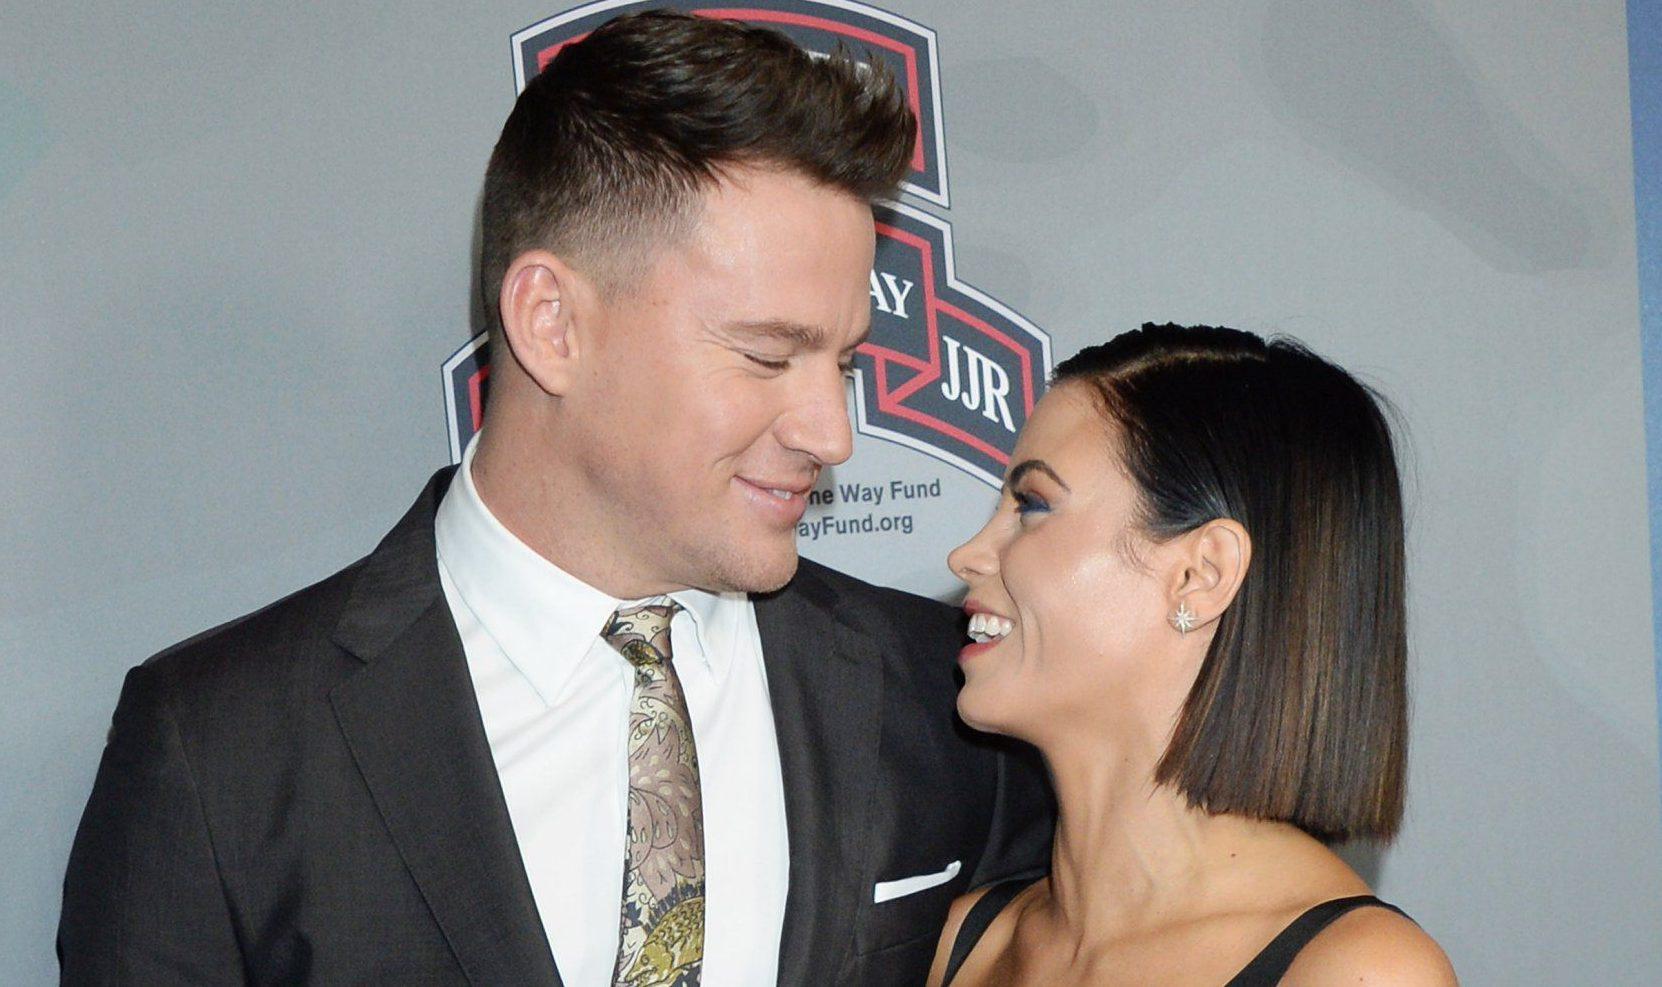 When did Channing Tatum split up with wife Jenna Dewan and start dating Jessie J?